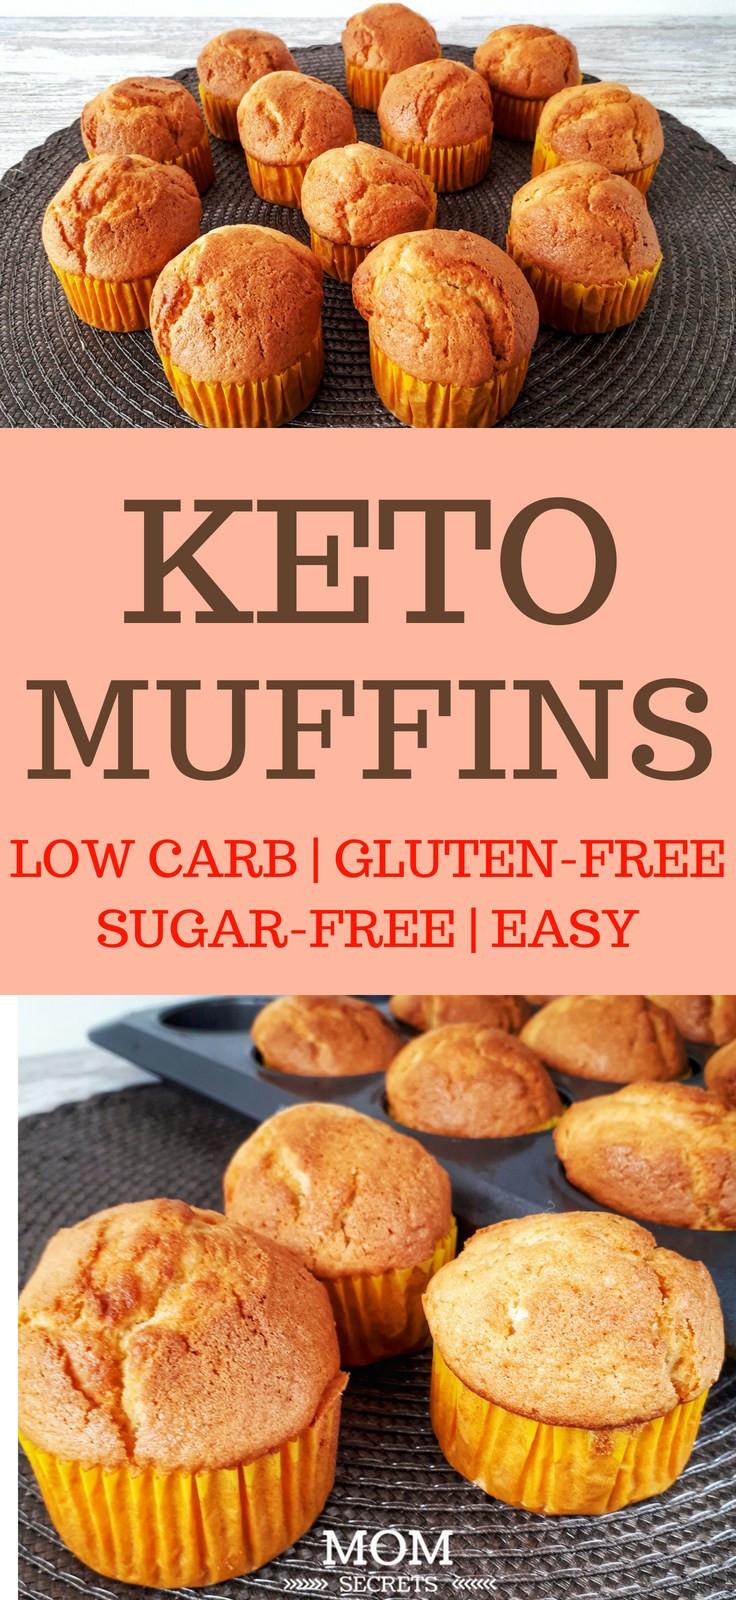 Keto Breakfast Recipes Easy On The Go  Quick Keto Breakfast the Go 15 Top Ideas for Fat